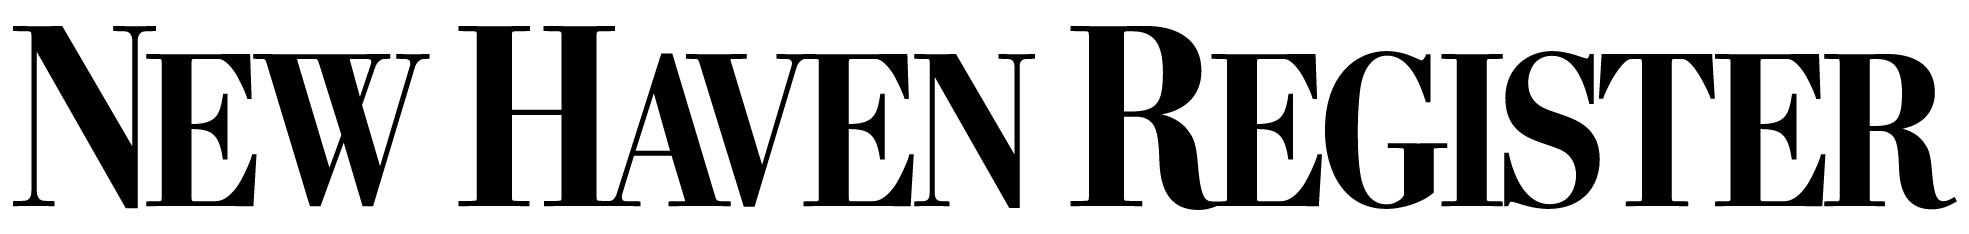 new_haven_register.png